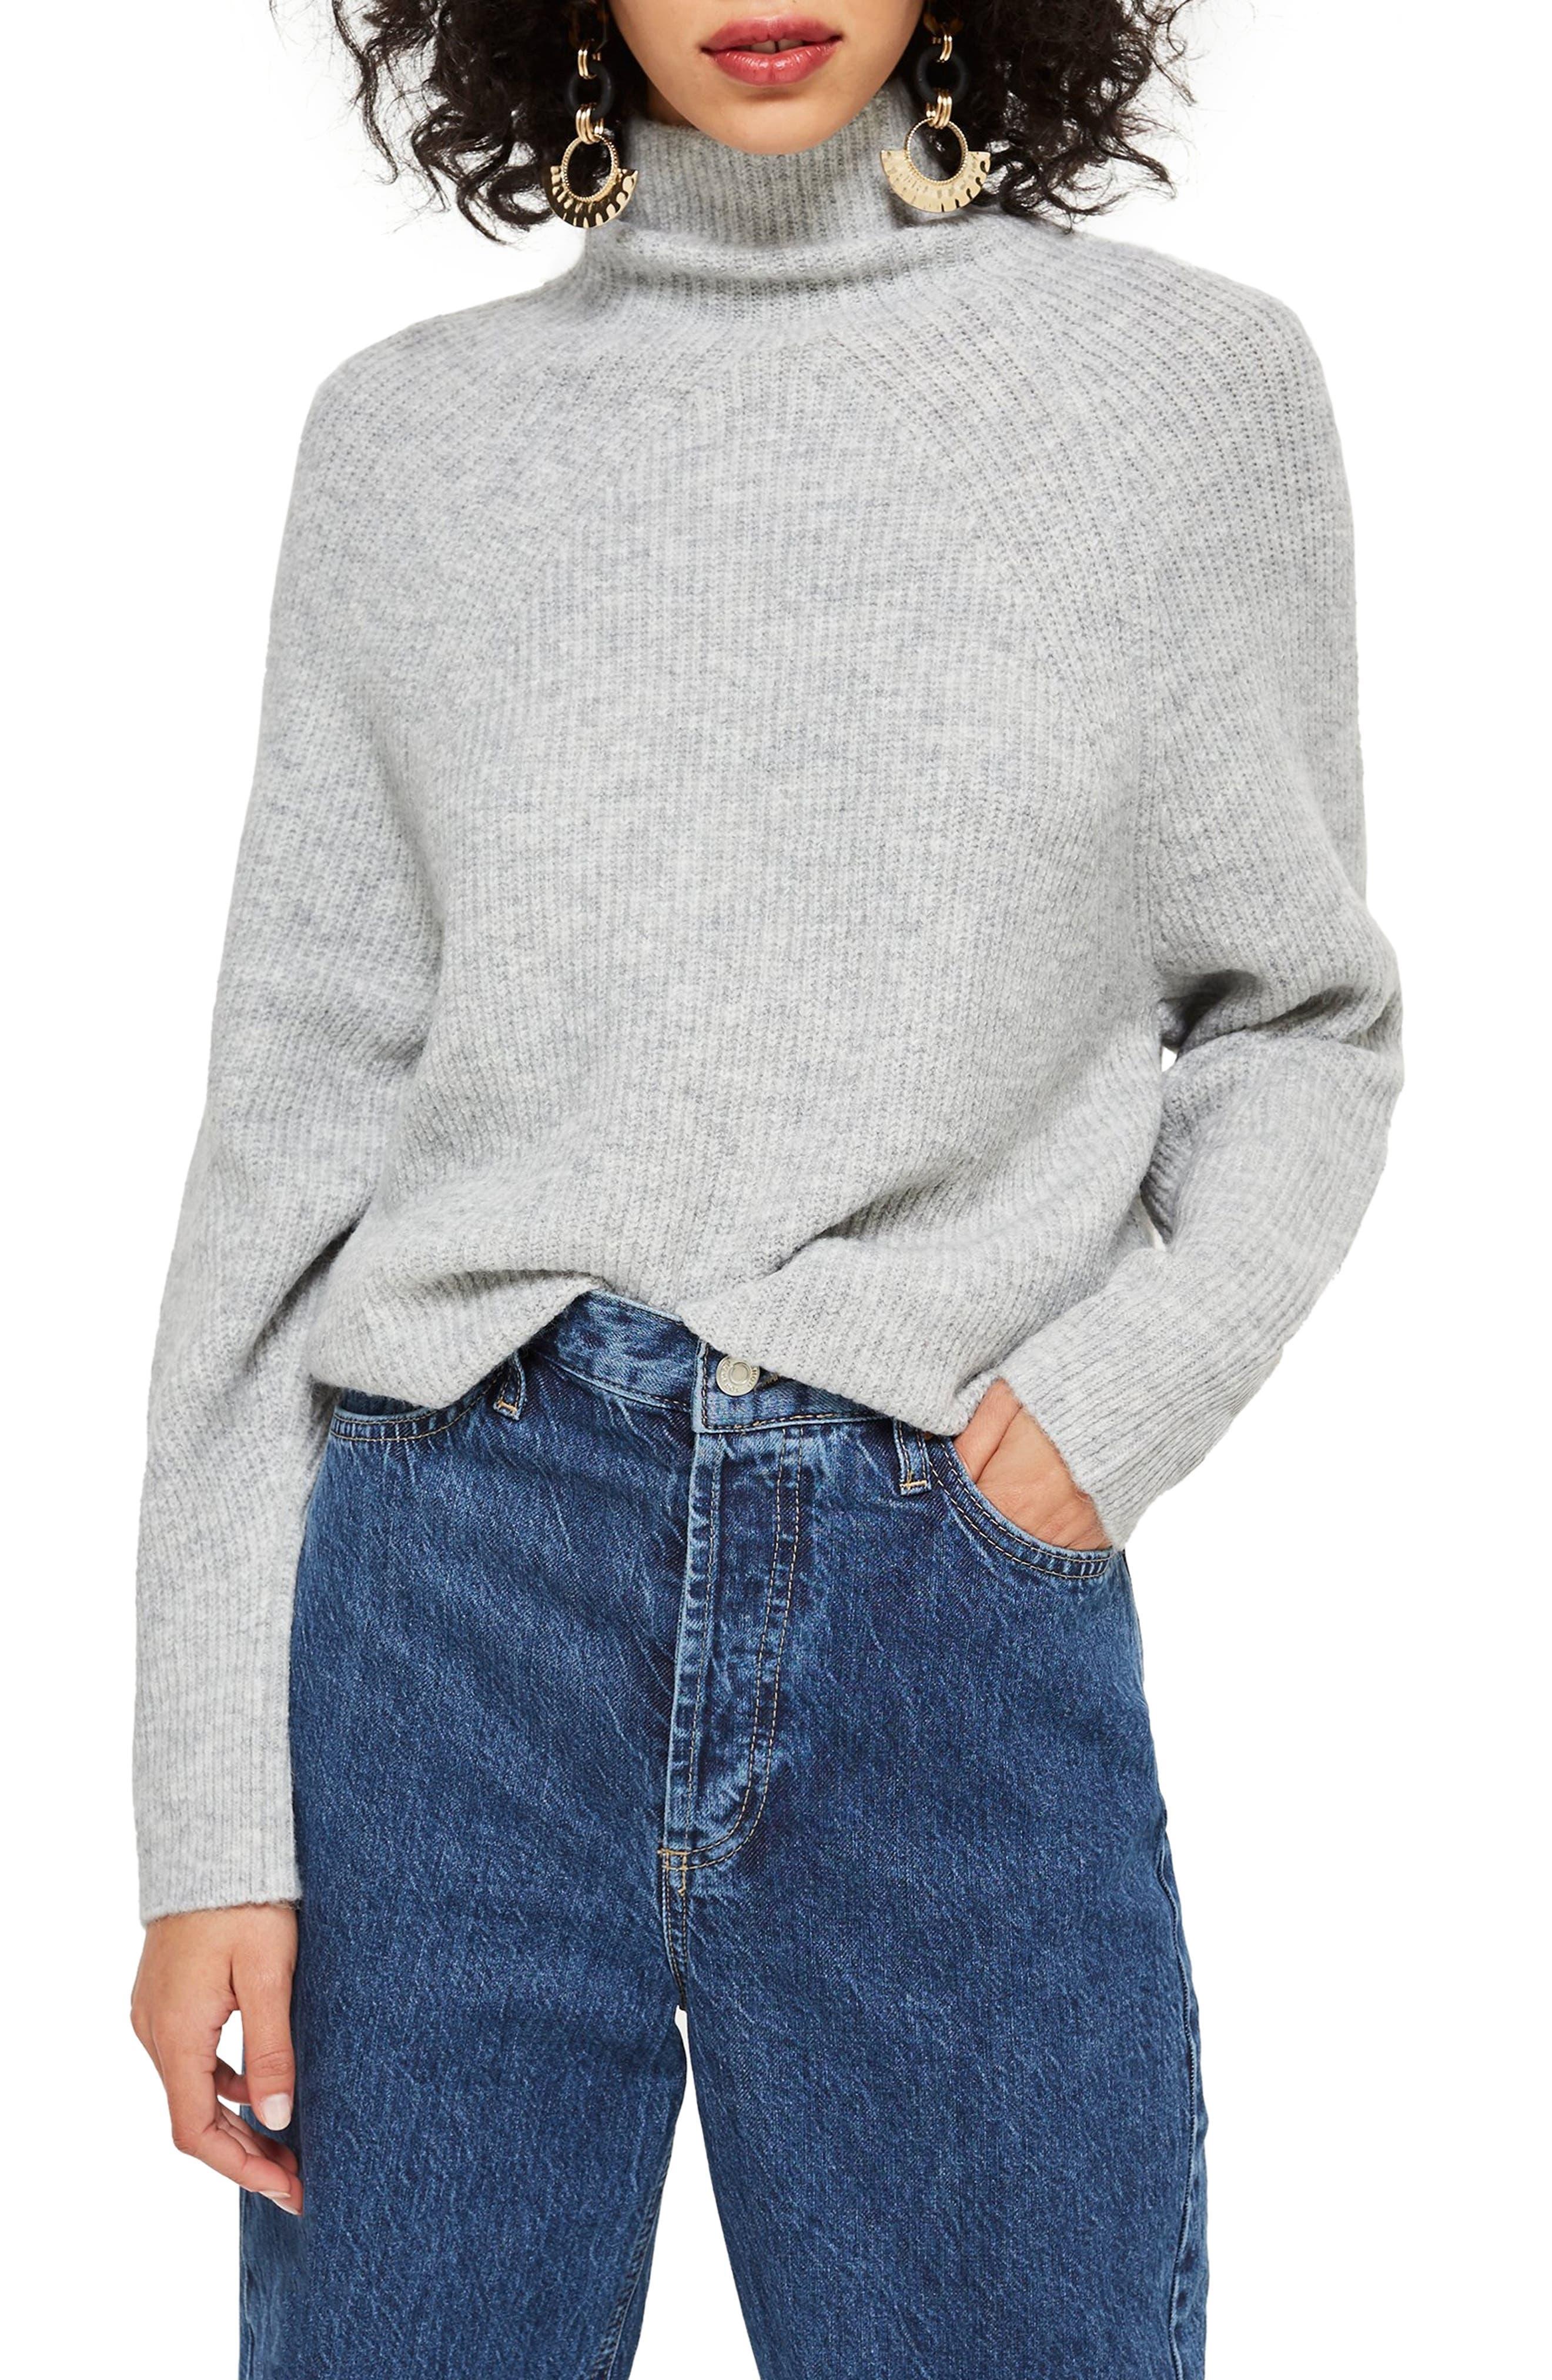 Raglan Turtleneck Neck Sweater,                         Main,                         color, GREY MARL